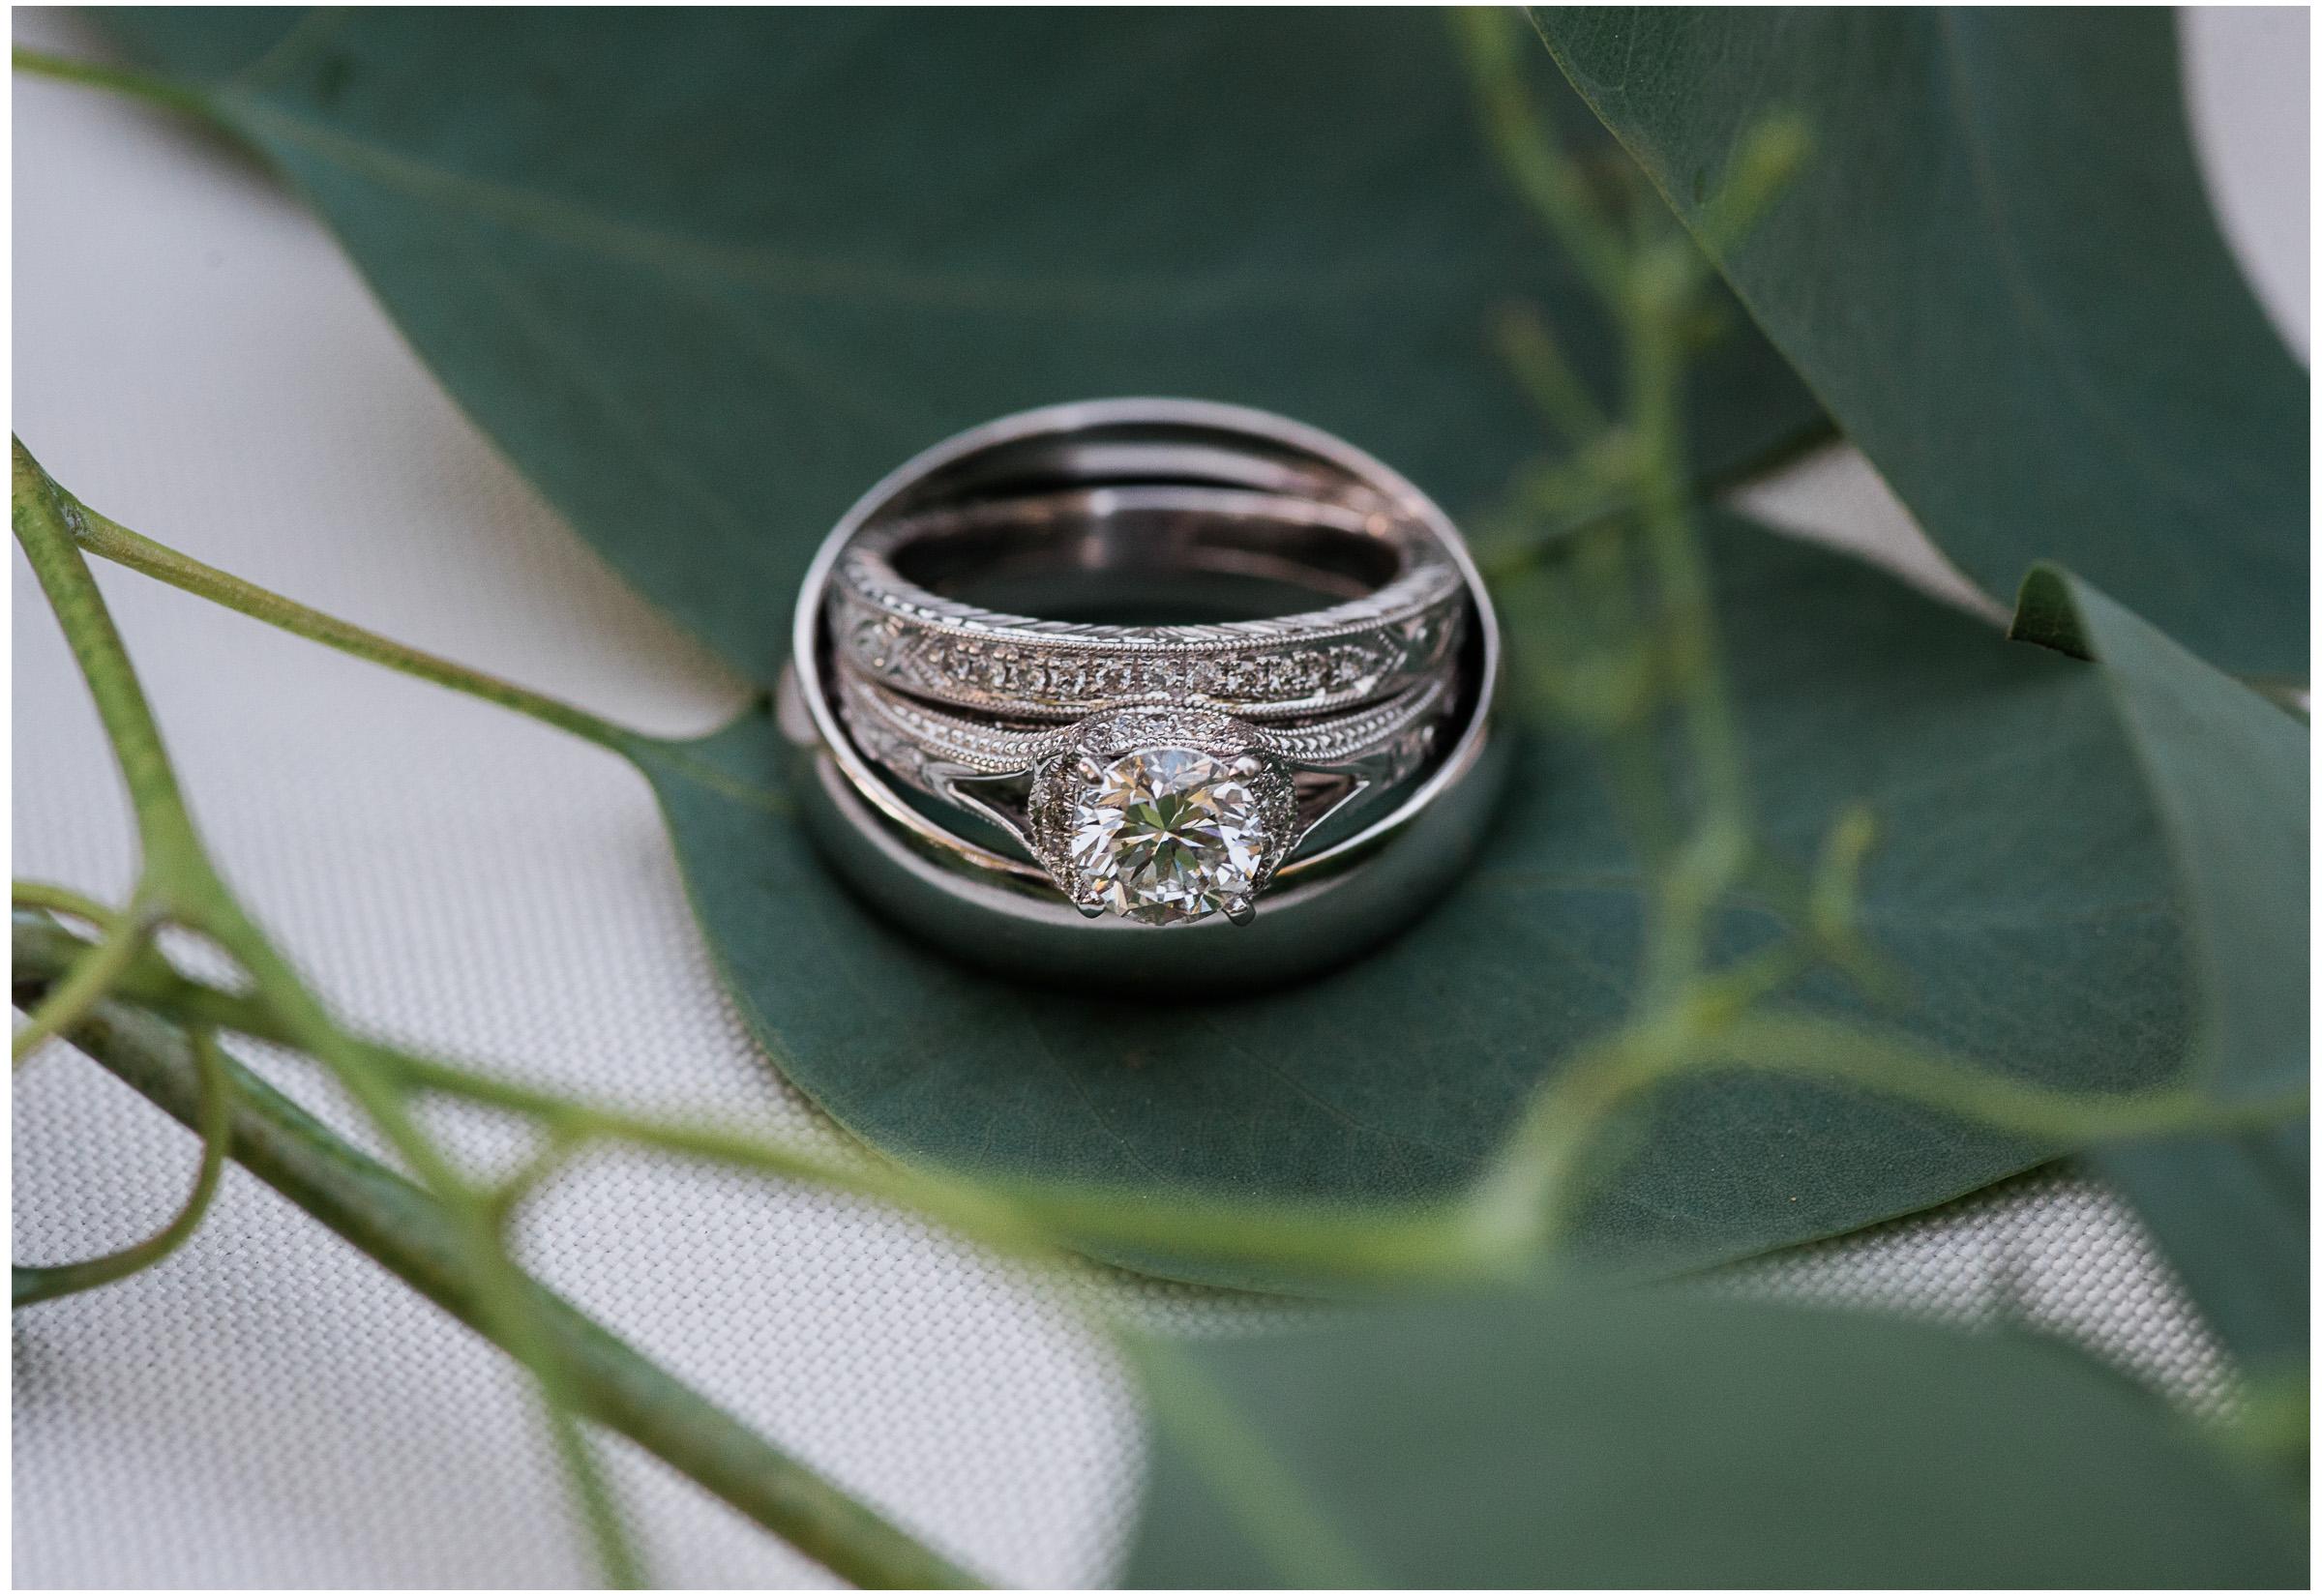 Placerville Wedding - Sacramento Photographer - Justin Wilcox Photography - 19.jpg